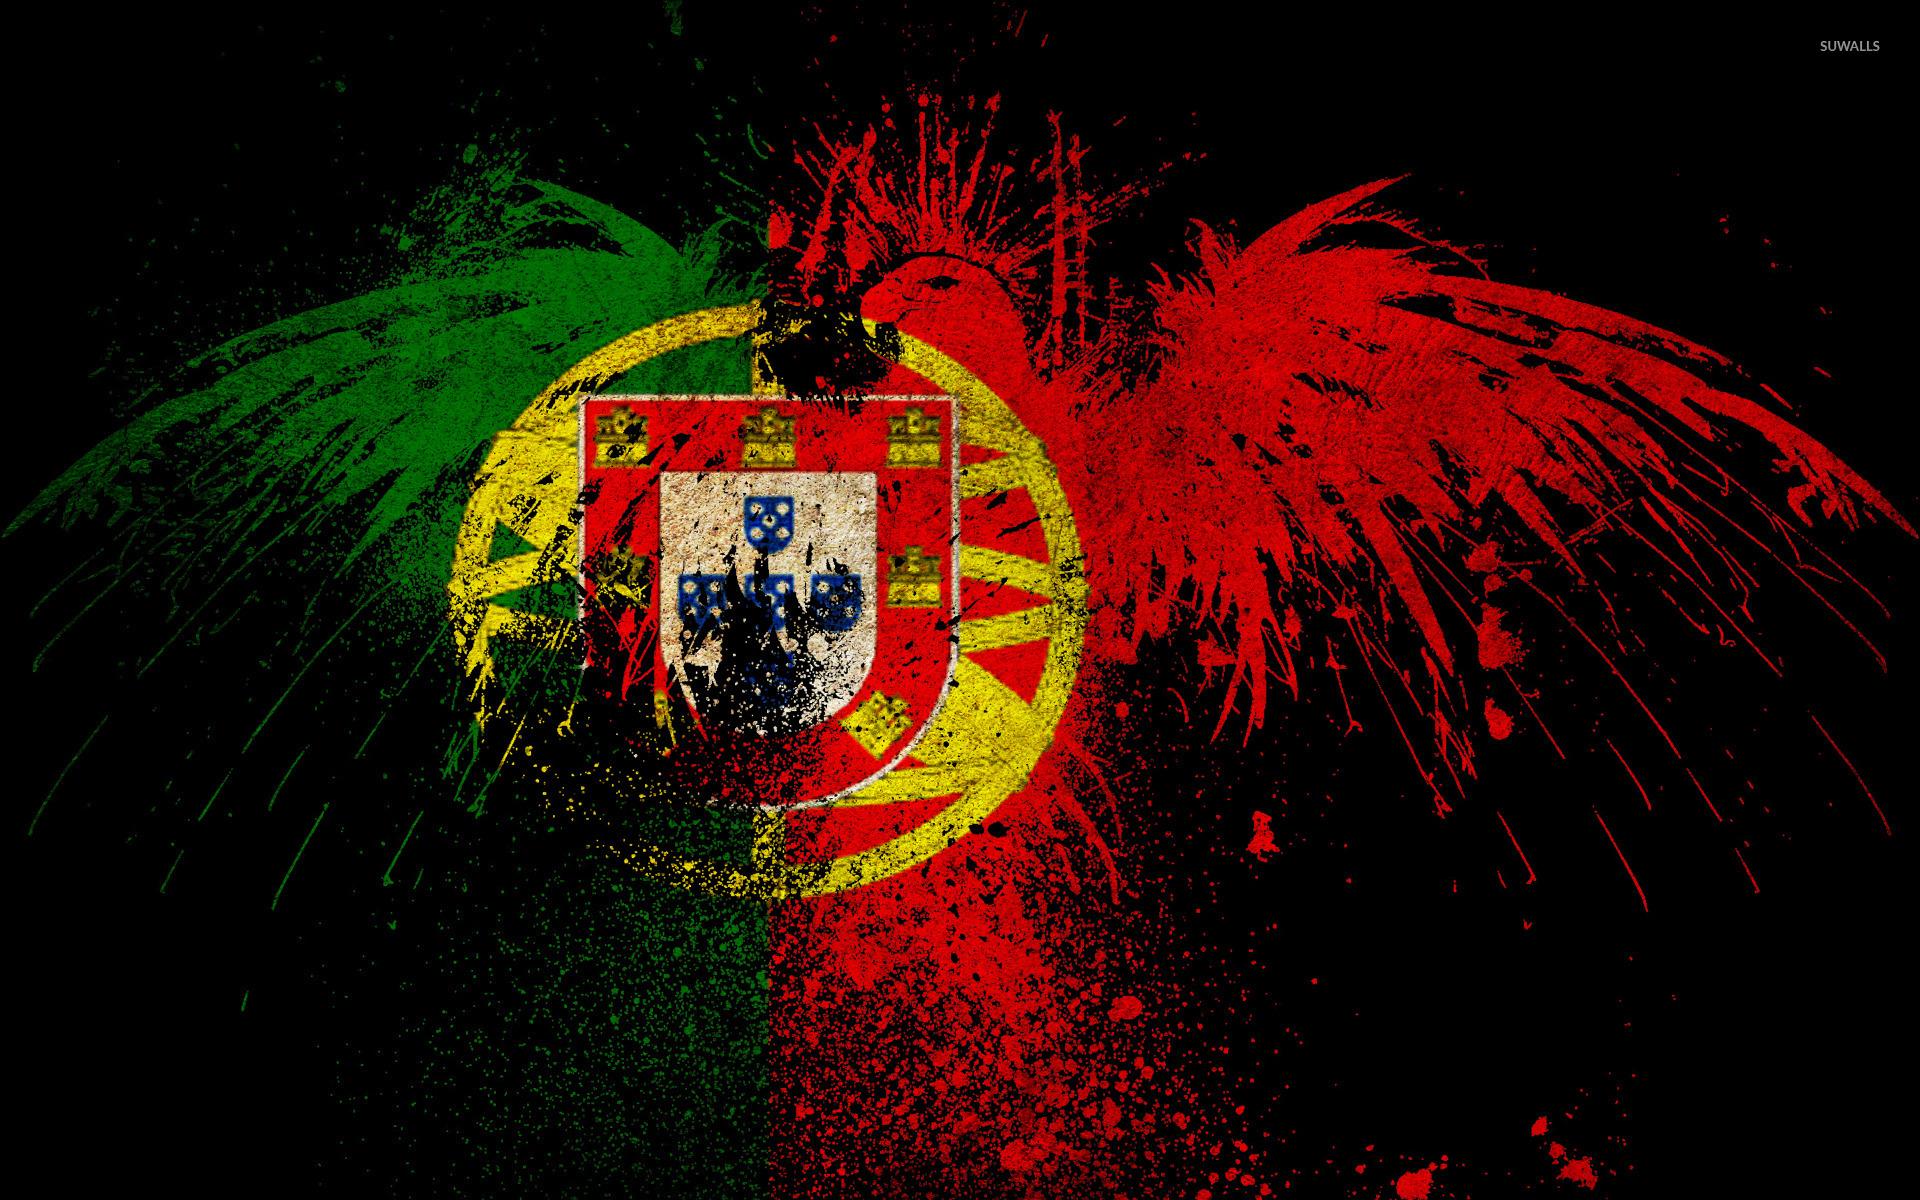 3d Background Wallpaper Apk Flag Of Portugal Wallpaper Digital Art Wallpapers 38864